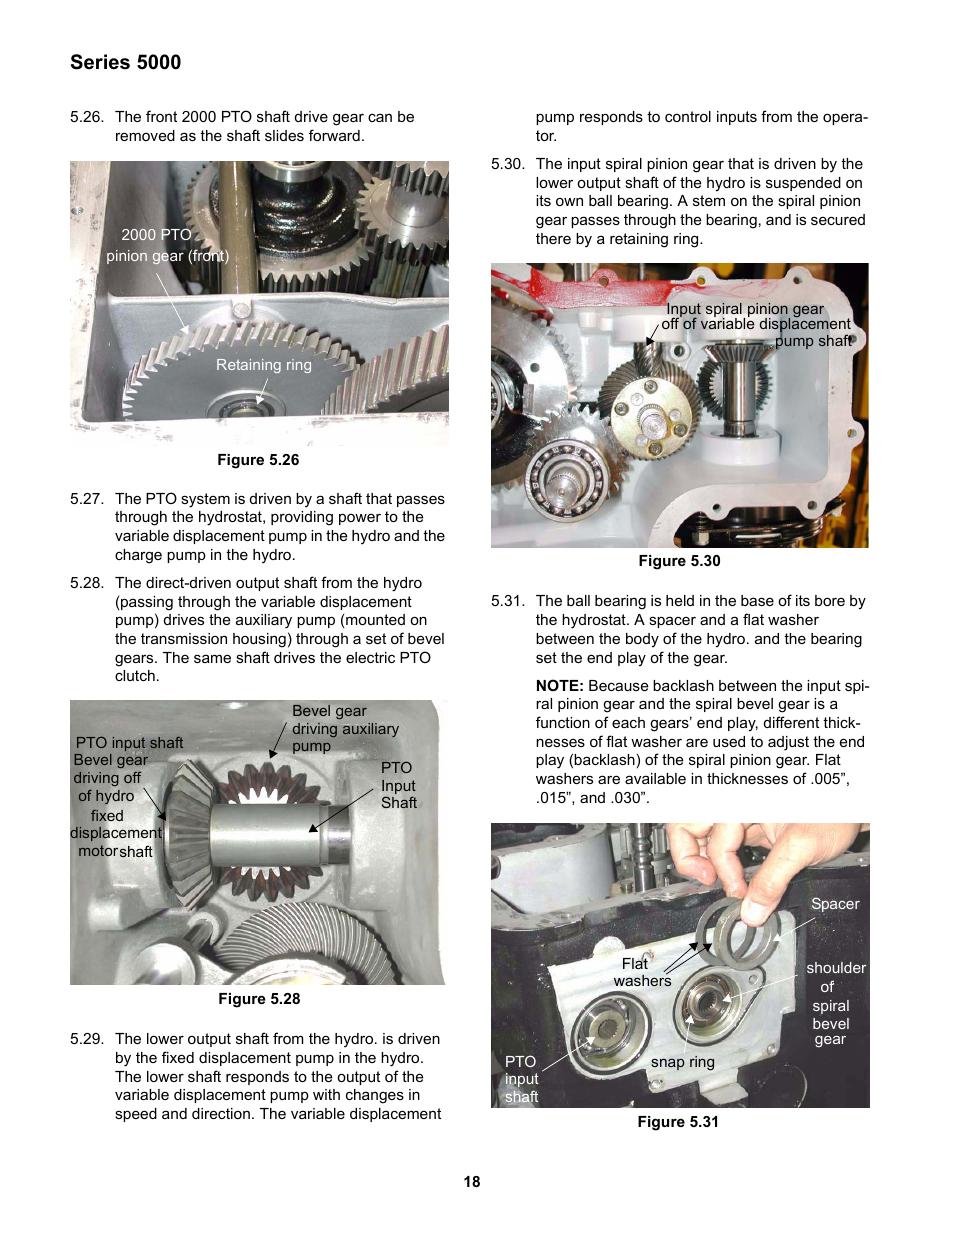 Series 5000 | Cub Cadet 5000 Series User Manual | Page 22 / 28